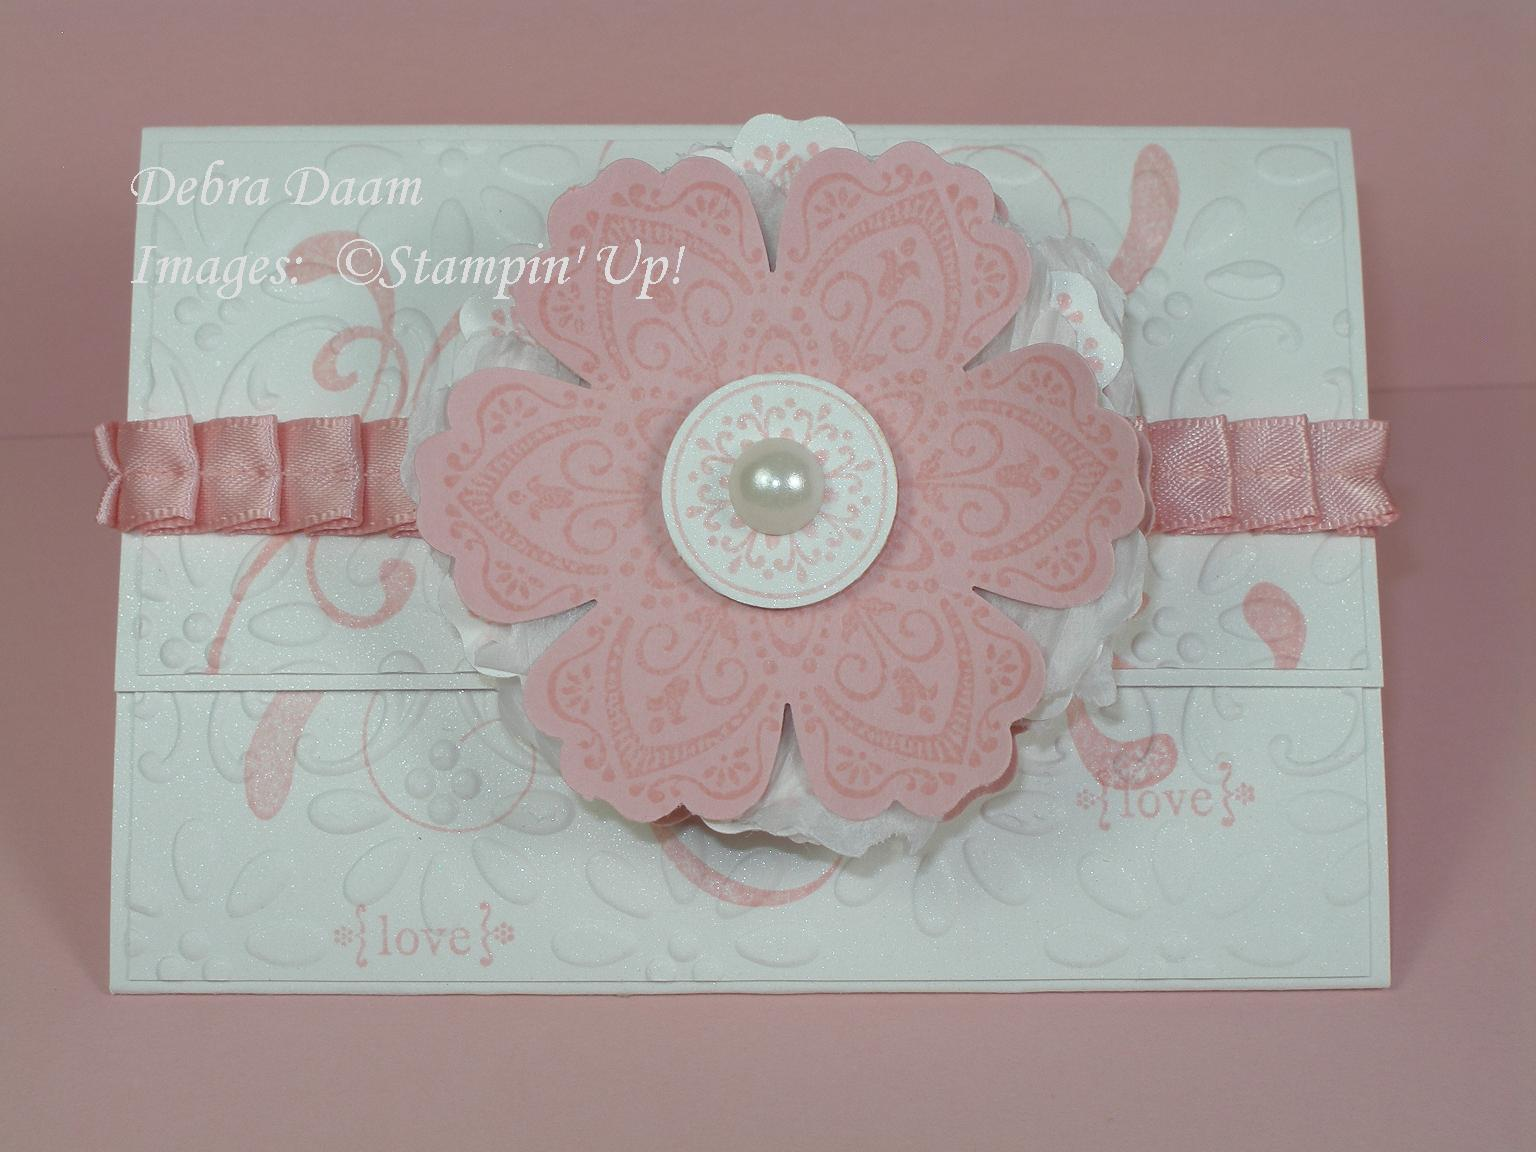 Gift Card Wedding Shower: Debra's Stamp Life: Wedding Shower Gift Card Holder